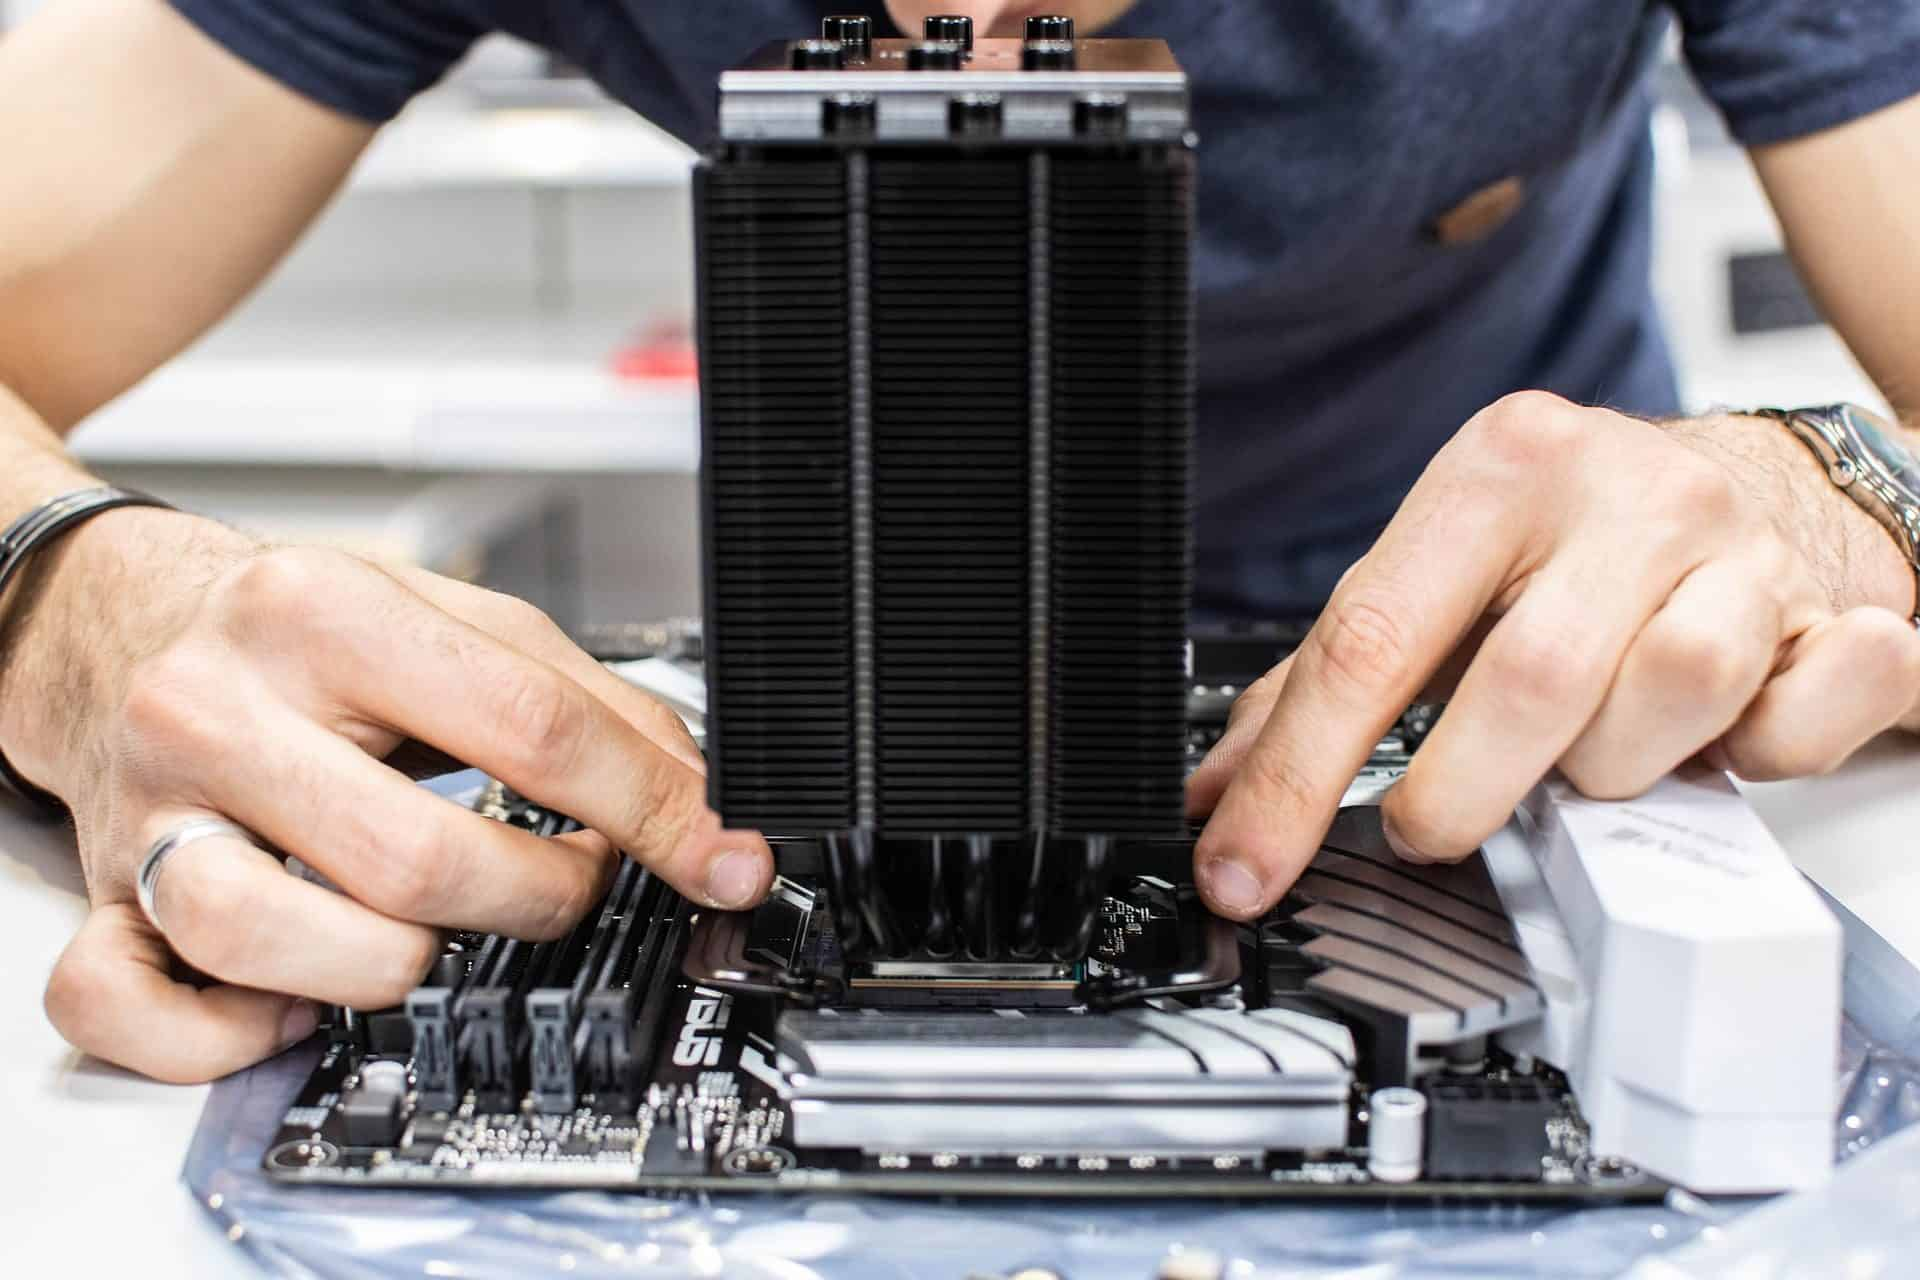 Upgrading Computer For Teaching Esl Online